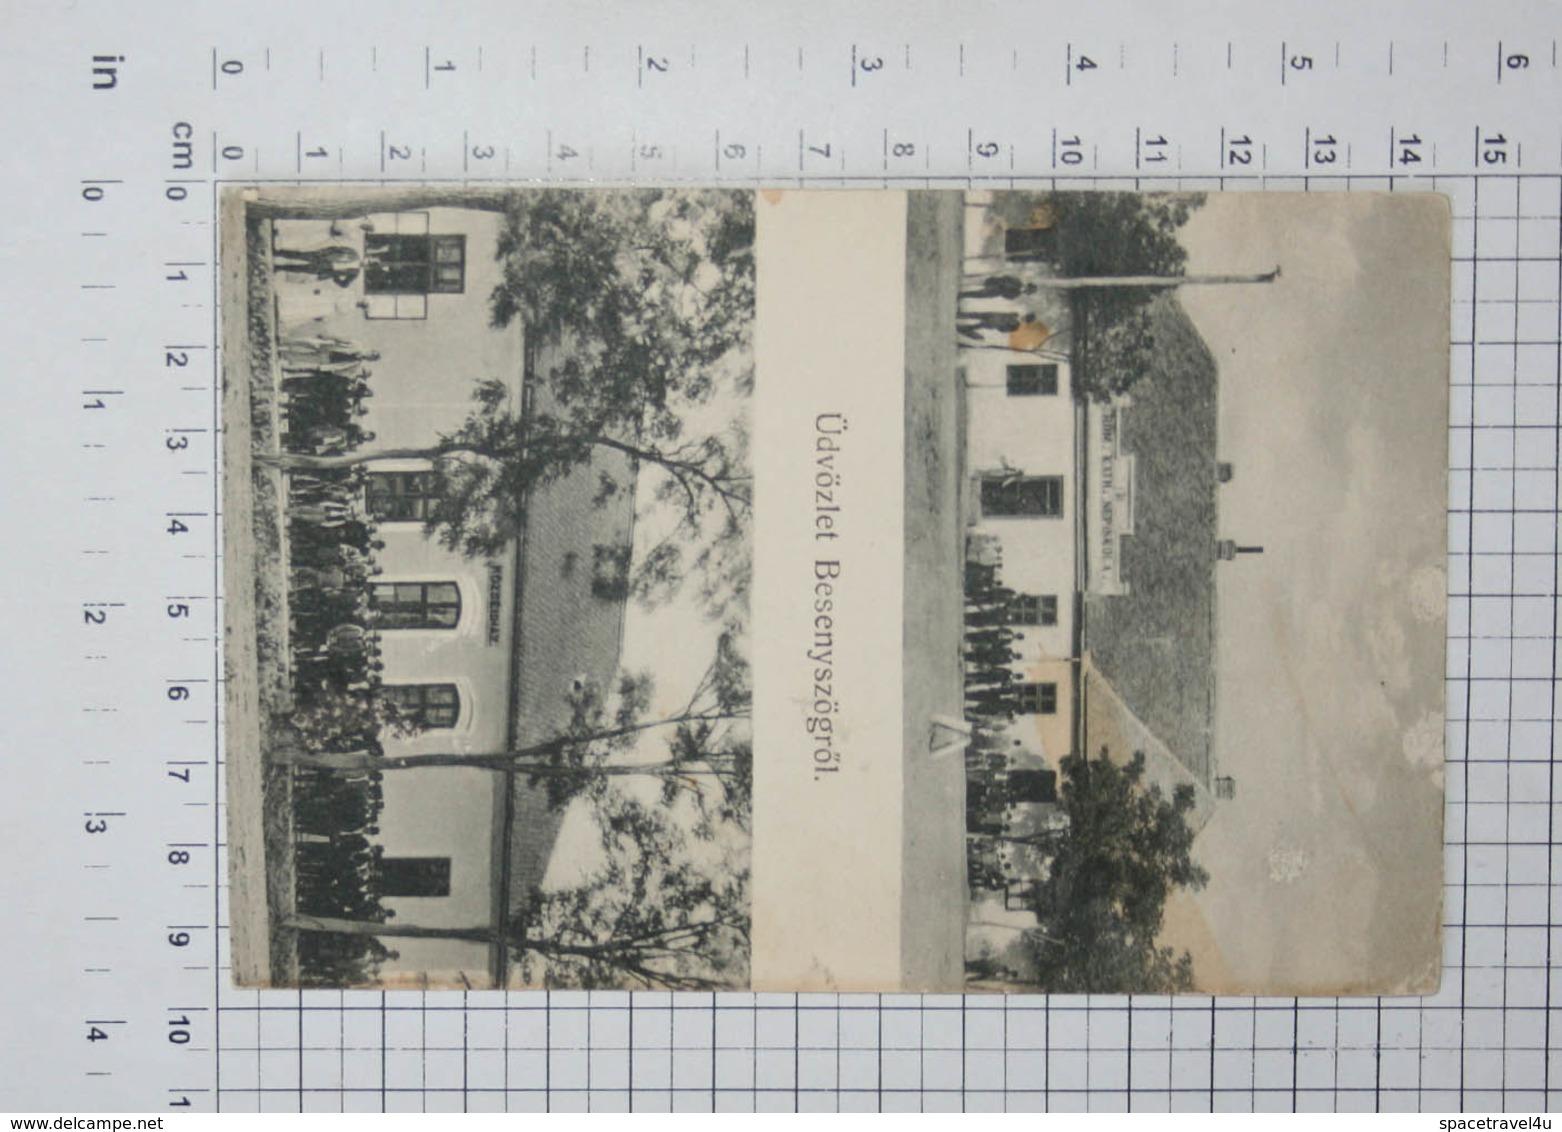 HUNGARY - Besenyszög, Roman Catholic School - Vintage Photo POSTCARD - (APAT2-68) - Hungary